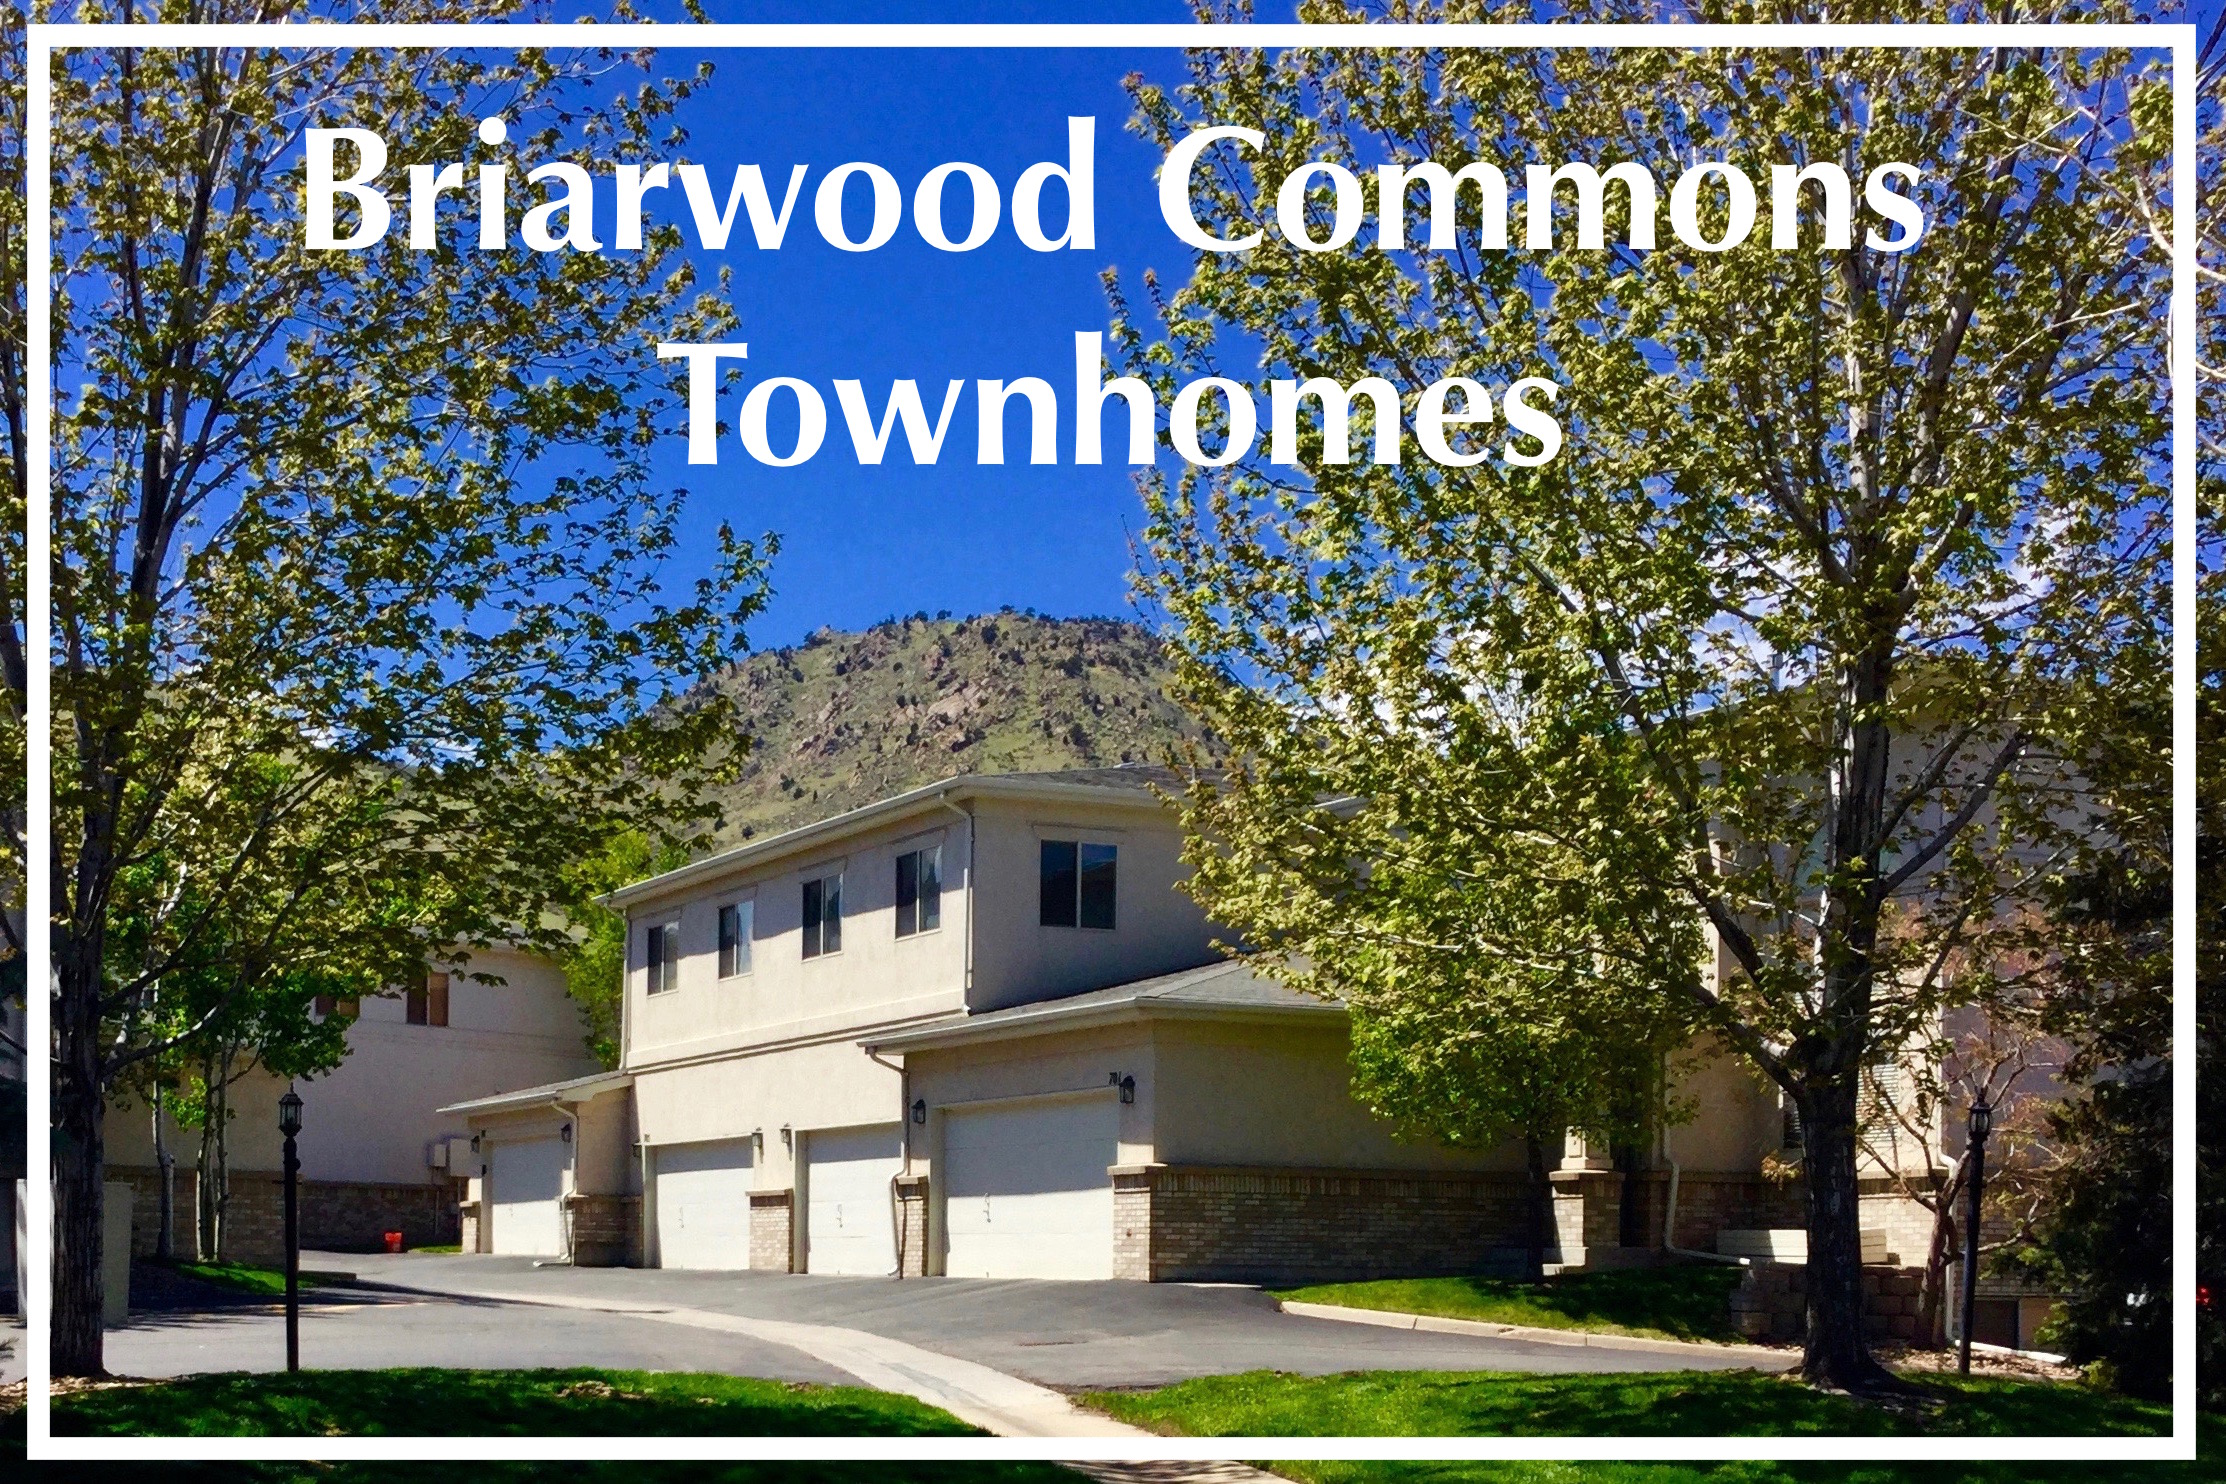 Briarwood Commons.jpg